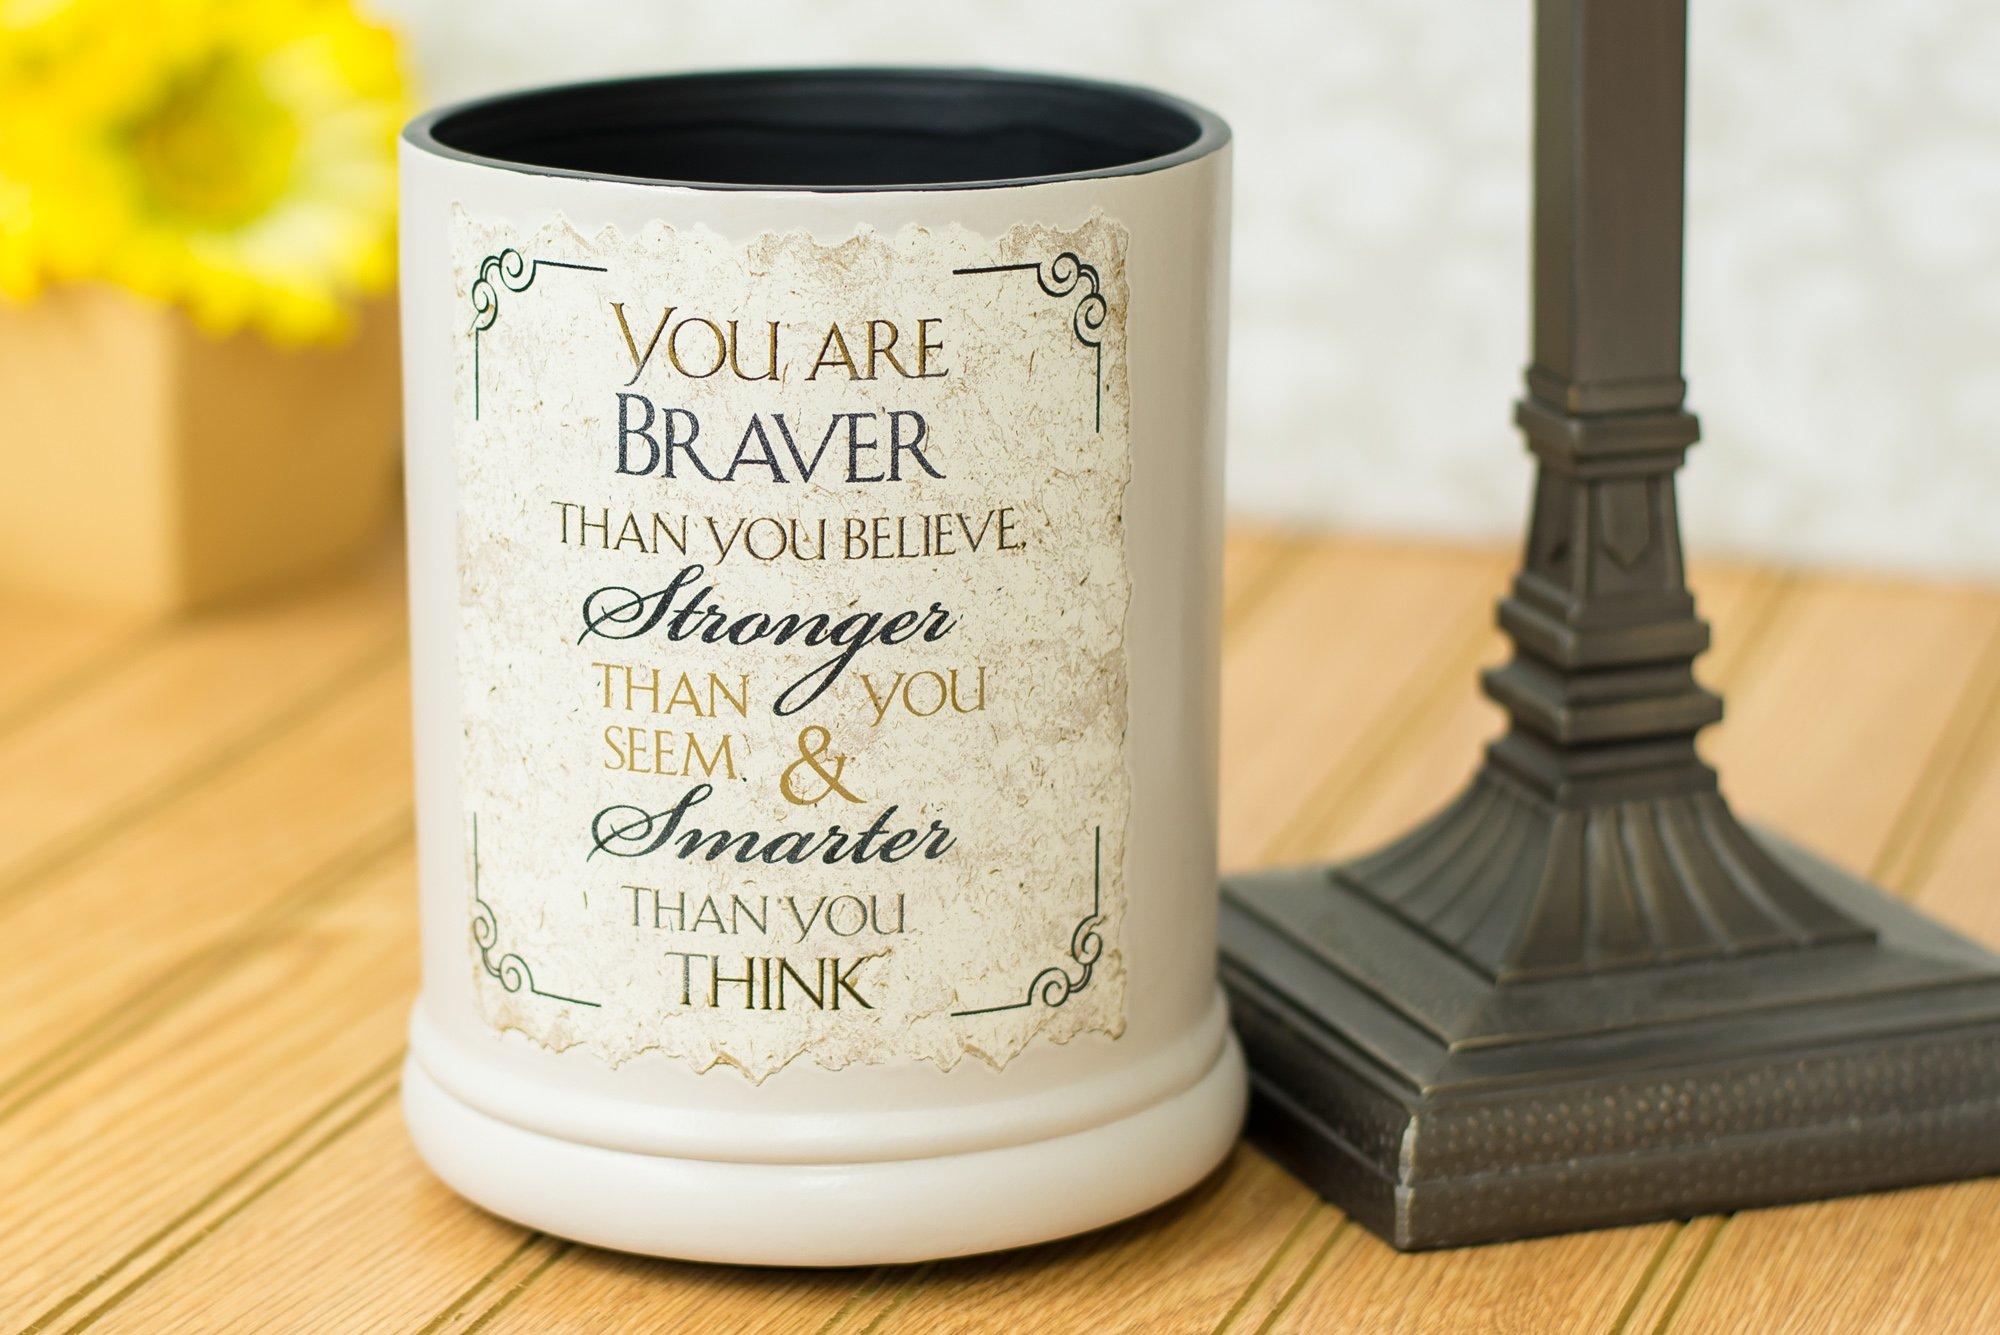 Elanze Designs You are Braver Stronger Smarter Ceramic Stoneware Electric Jar Candle Warmer by Elanze Designs (Image #2)